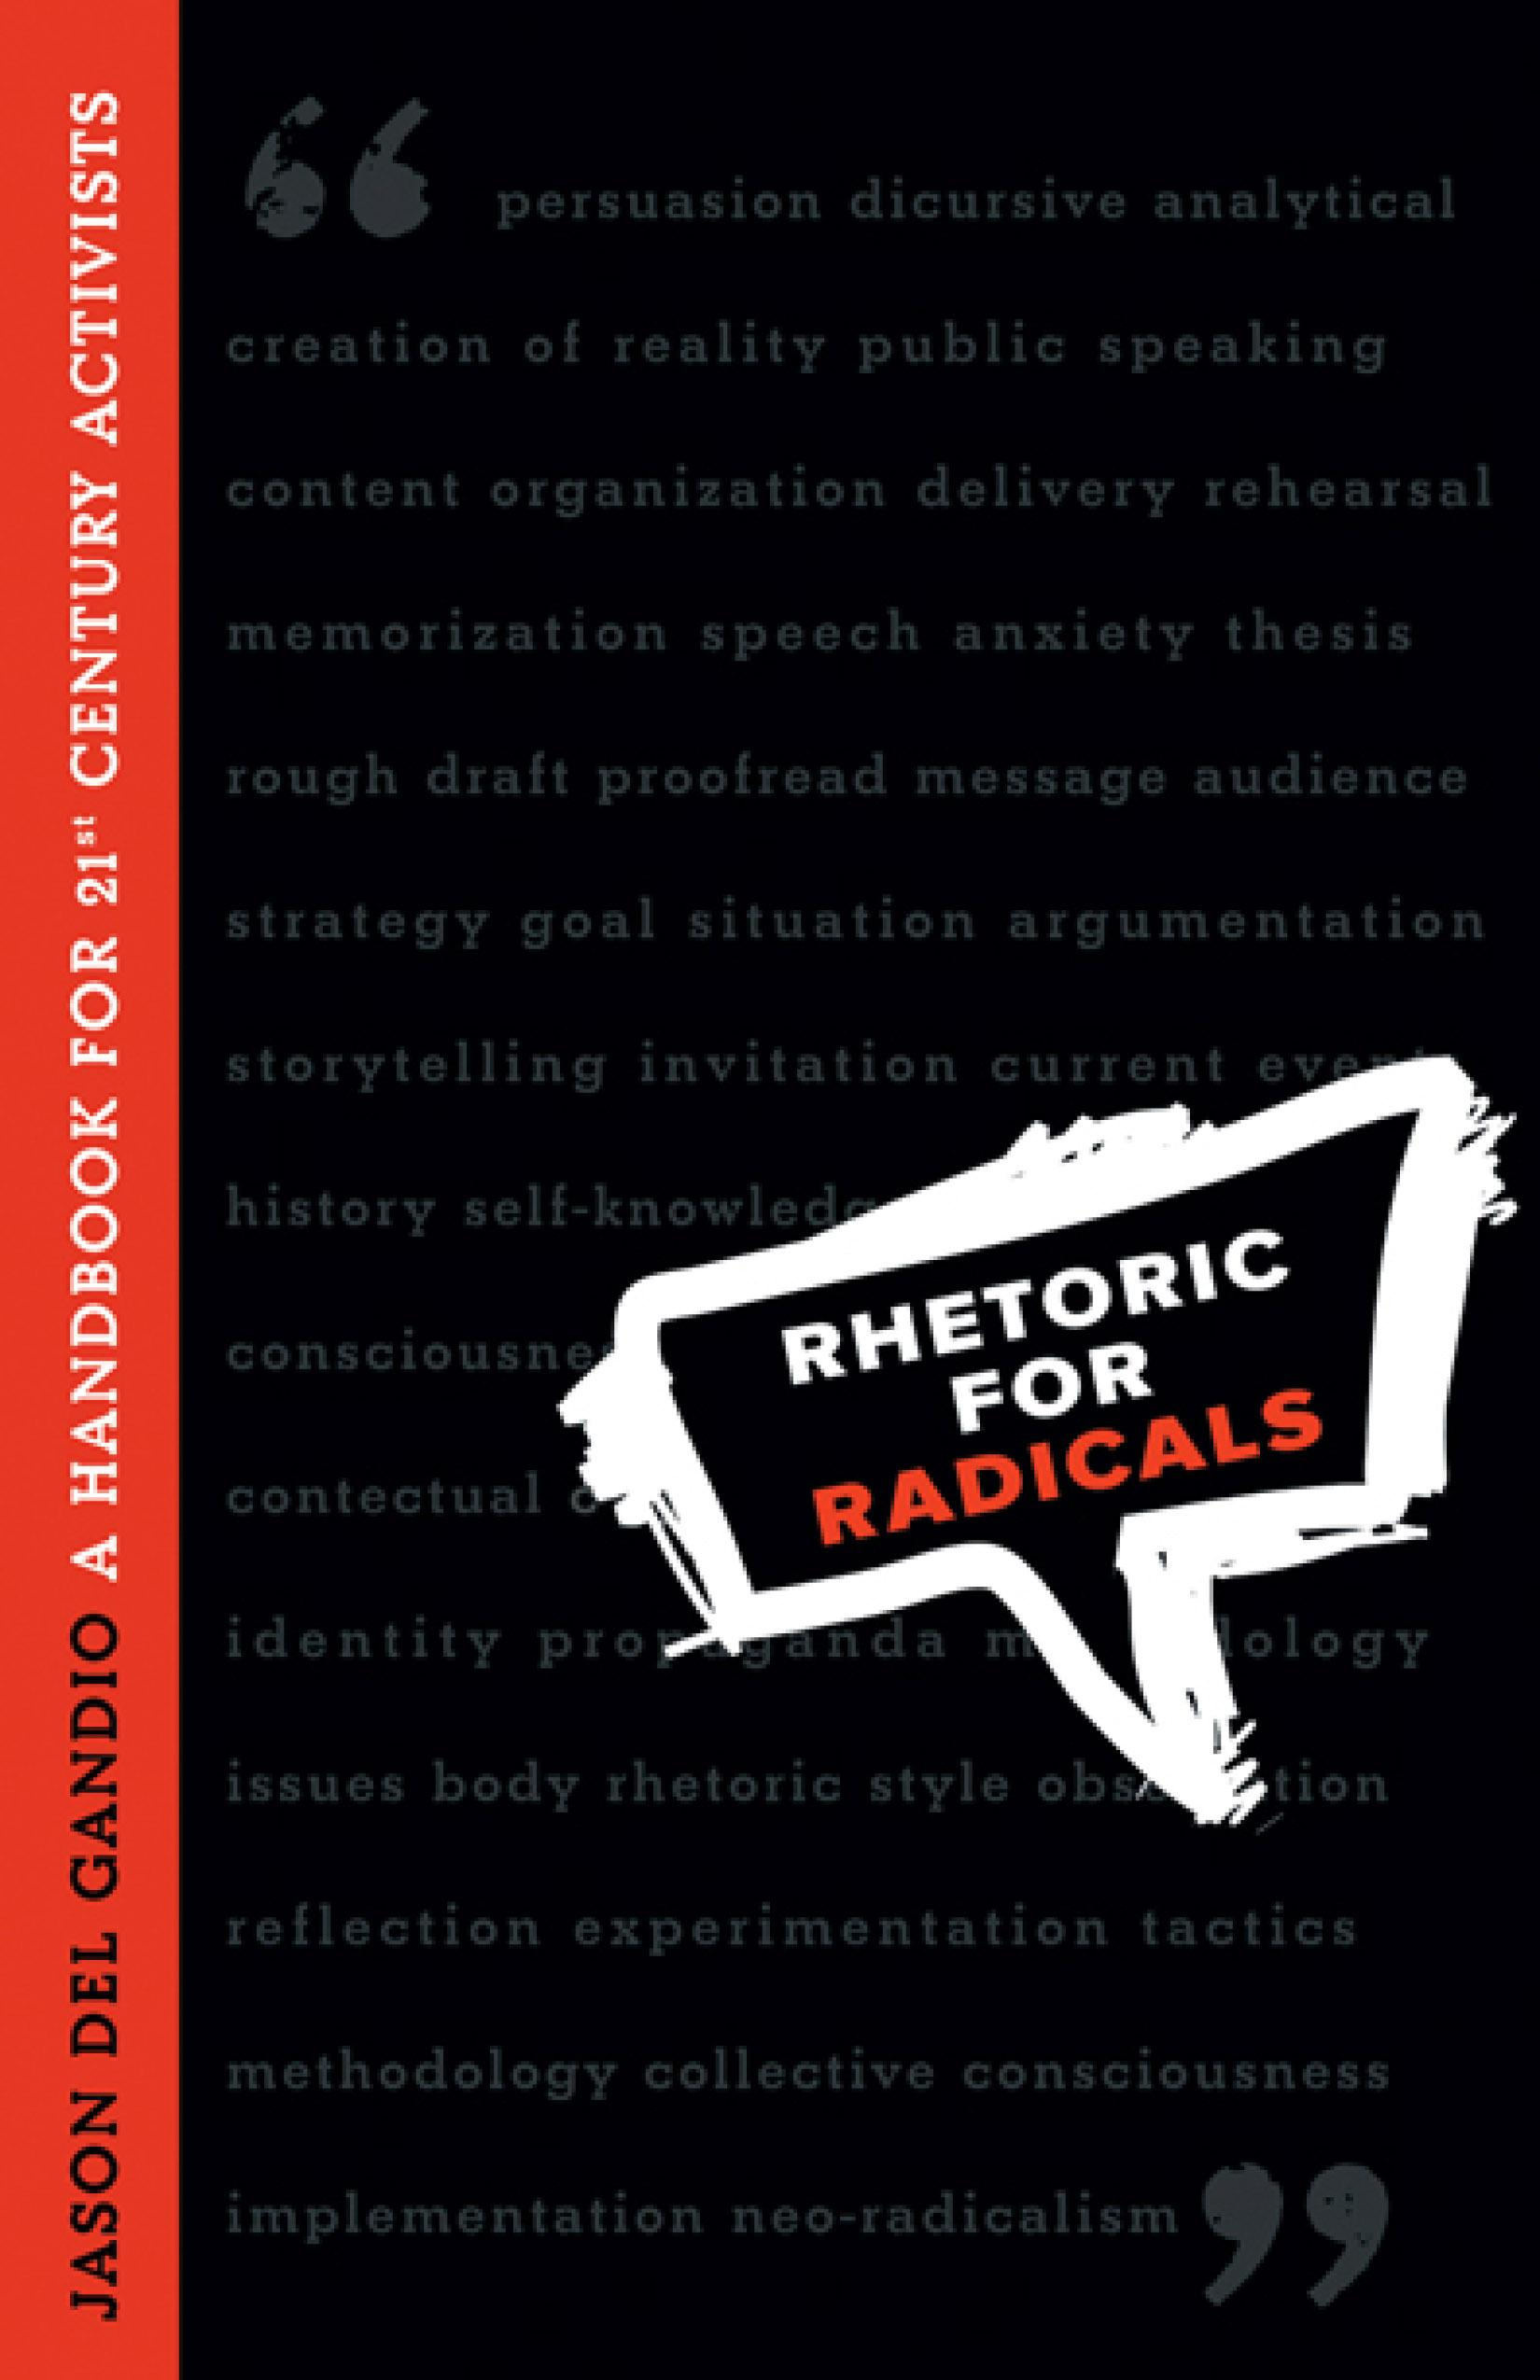 Rhetoric for Radicals: A Handbook for 21st Century Activists EB9781550924114